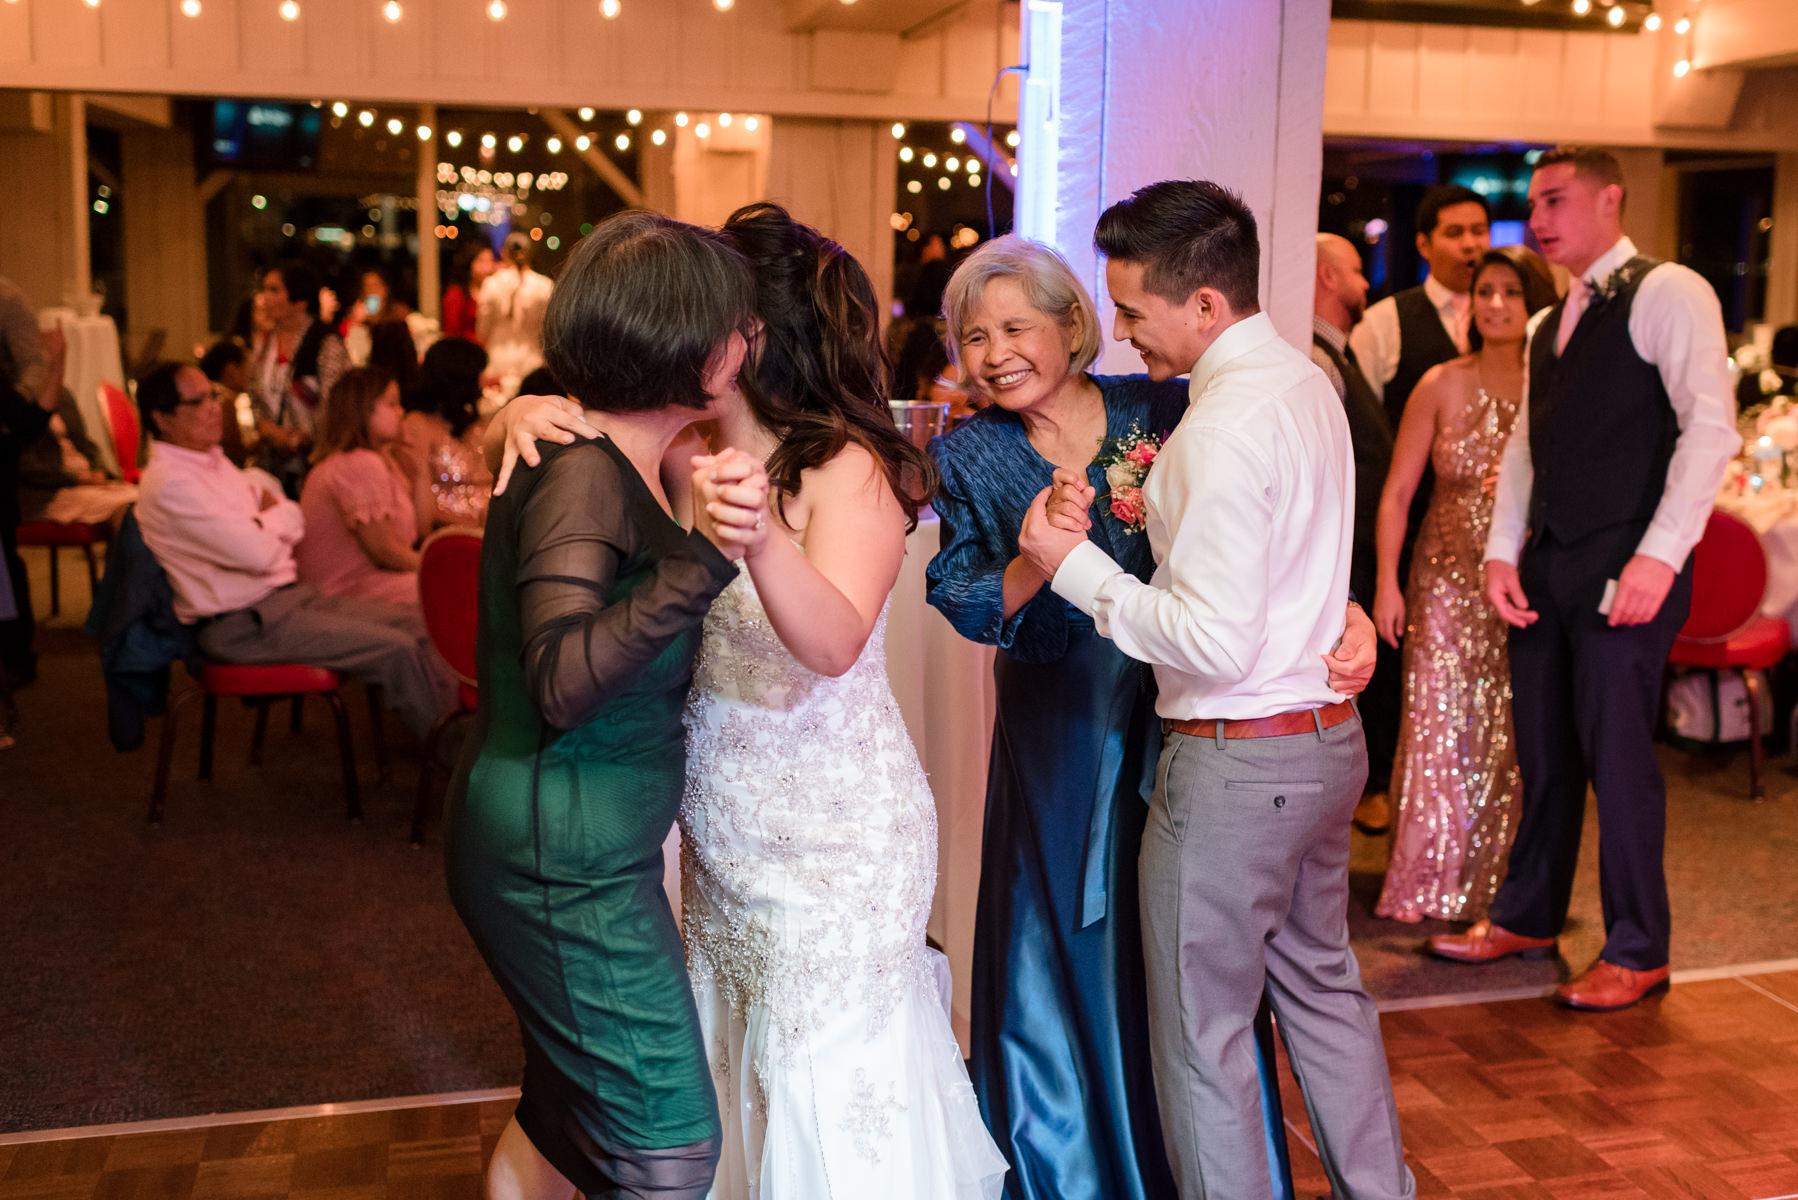 Andrew Tat - Documentary Wedding Photography - Salty's - Seattle, Washington -Mark & Marcy - 27.jpg